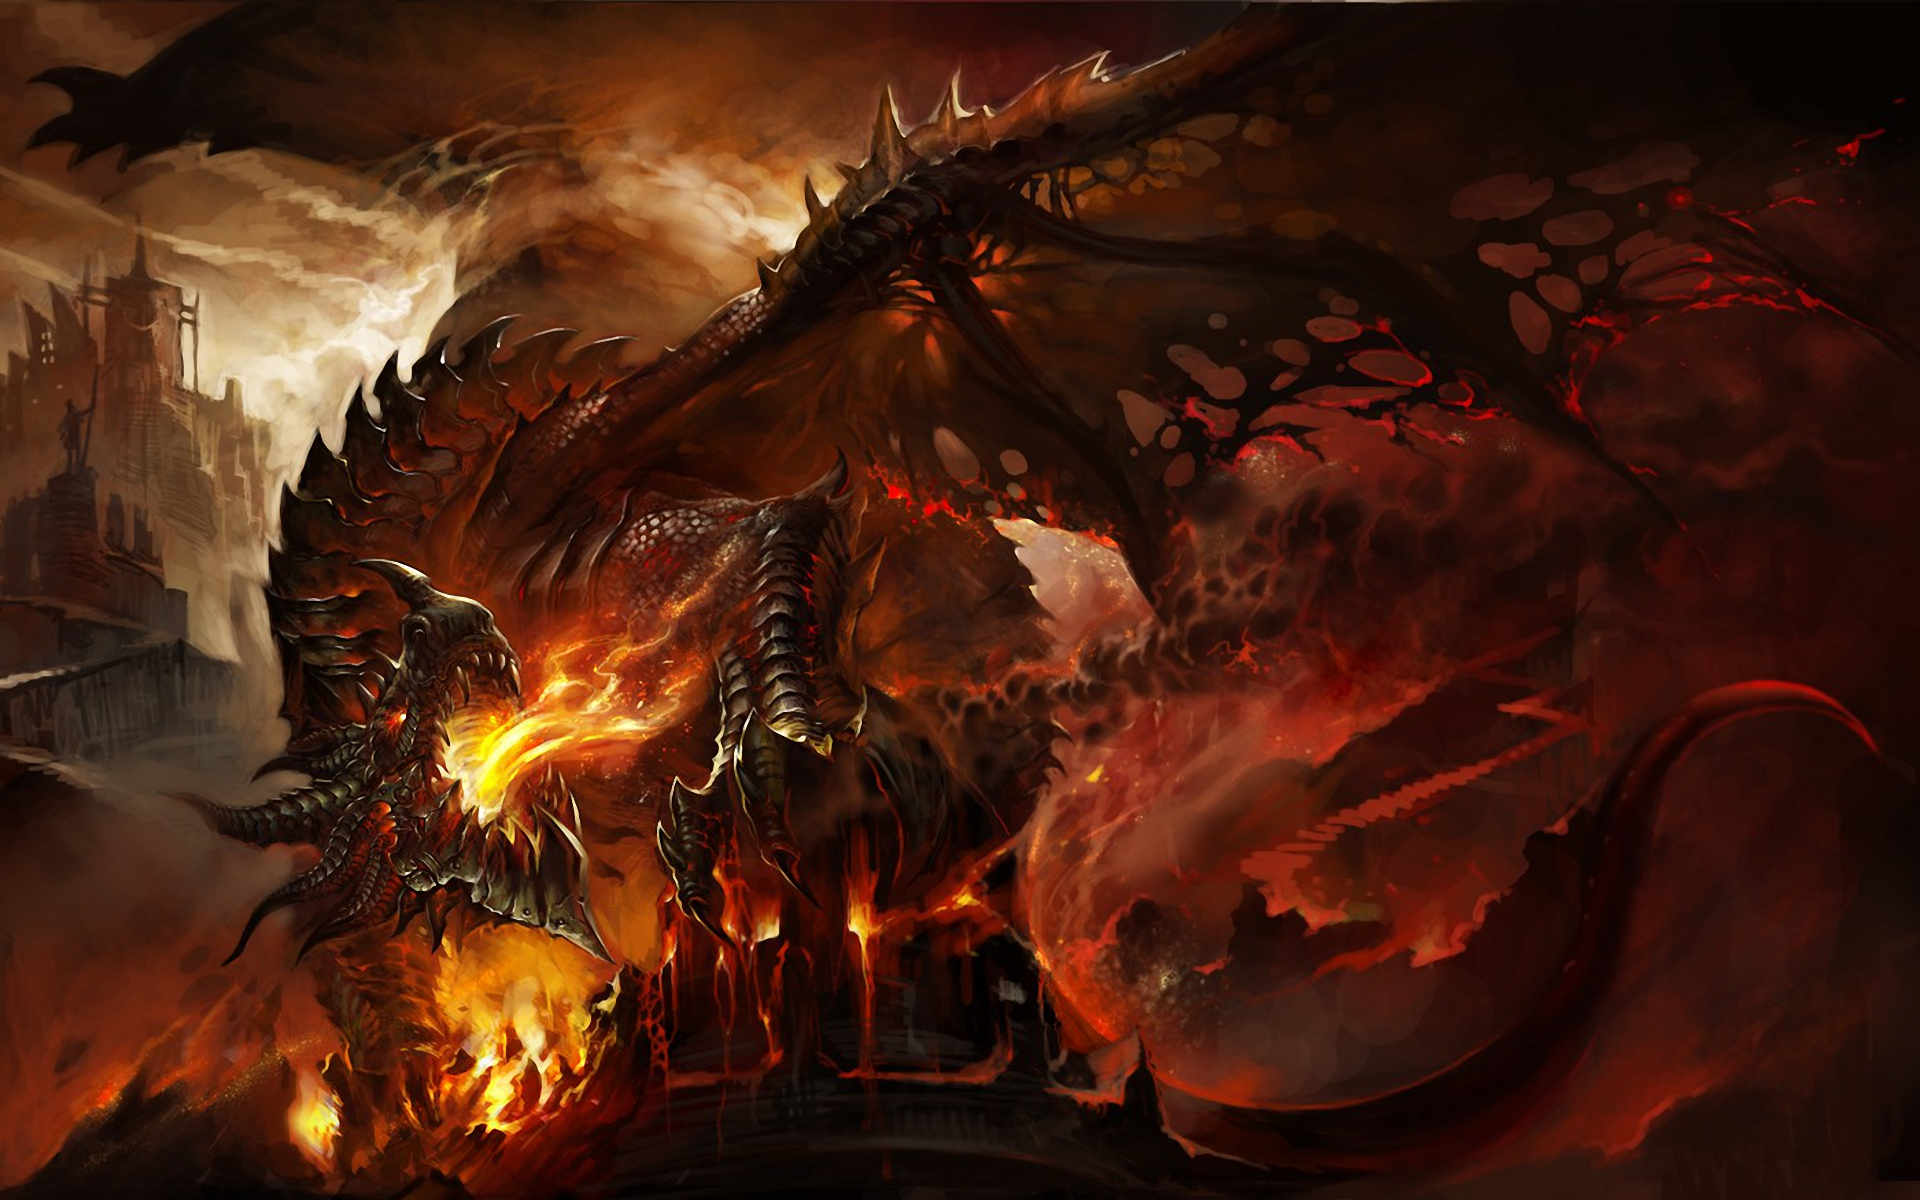 Epic Dragon Backgrounds wallpaper wallpaper hd background desktop 1920x1200